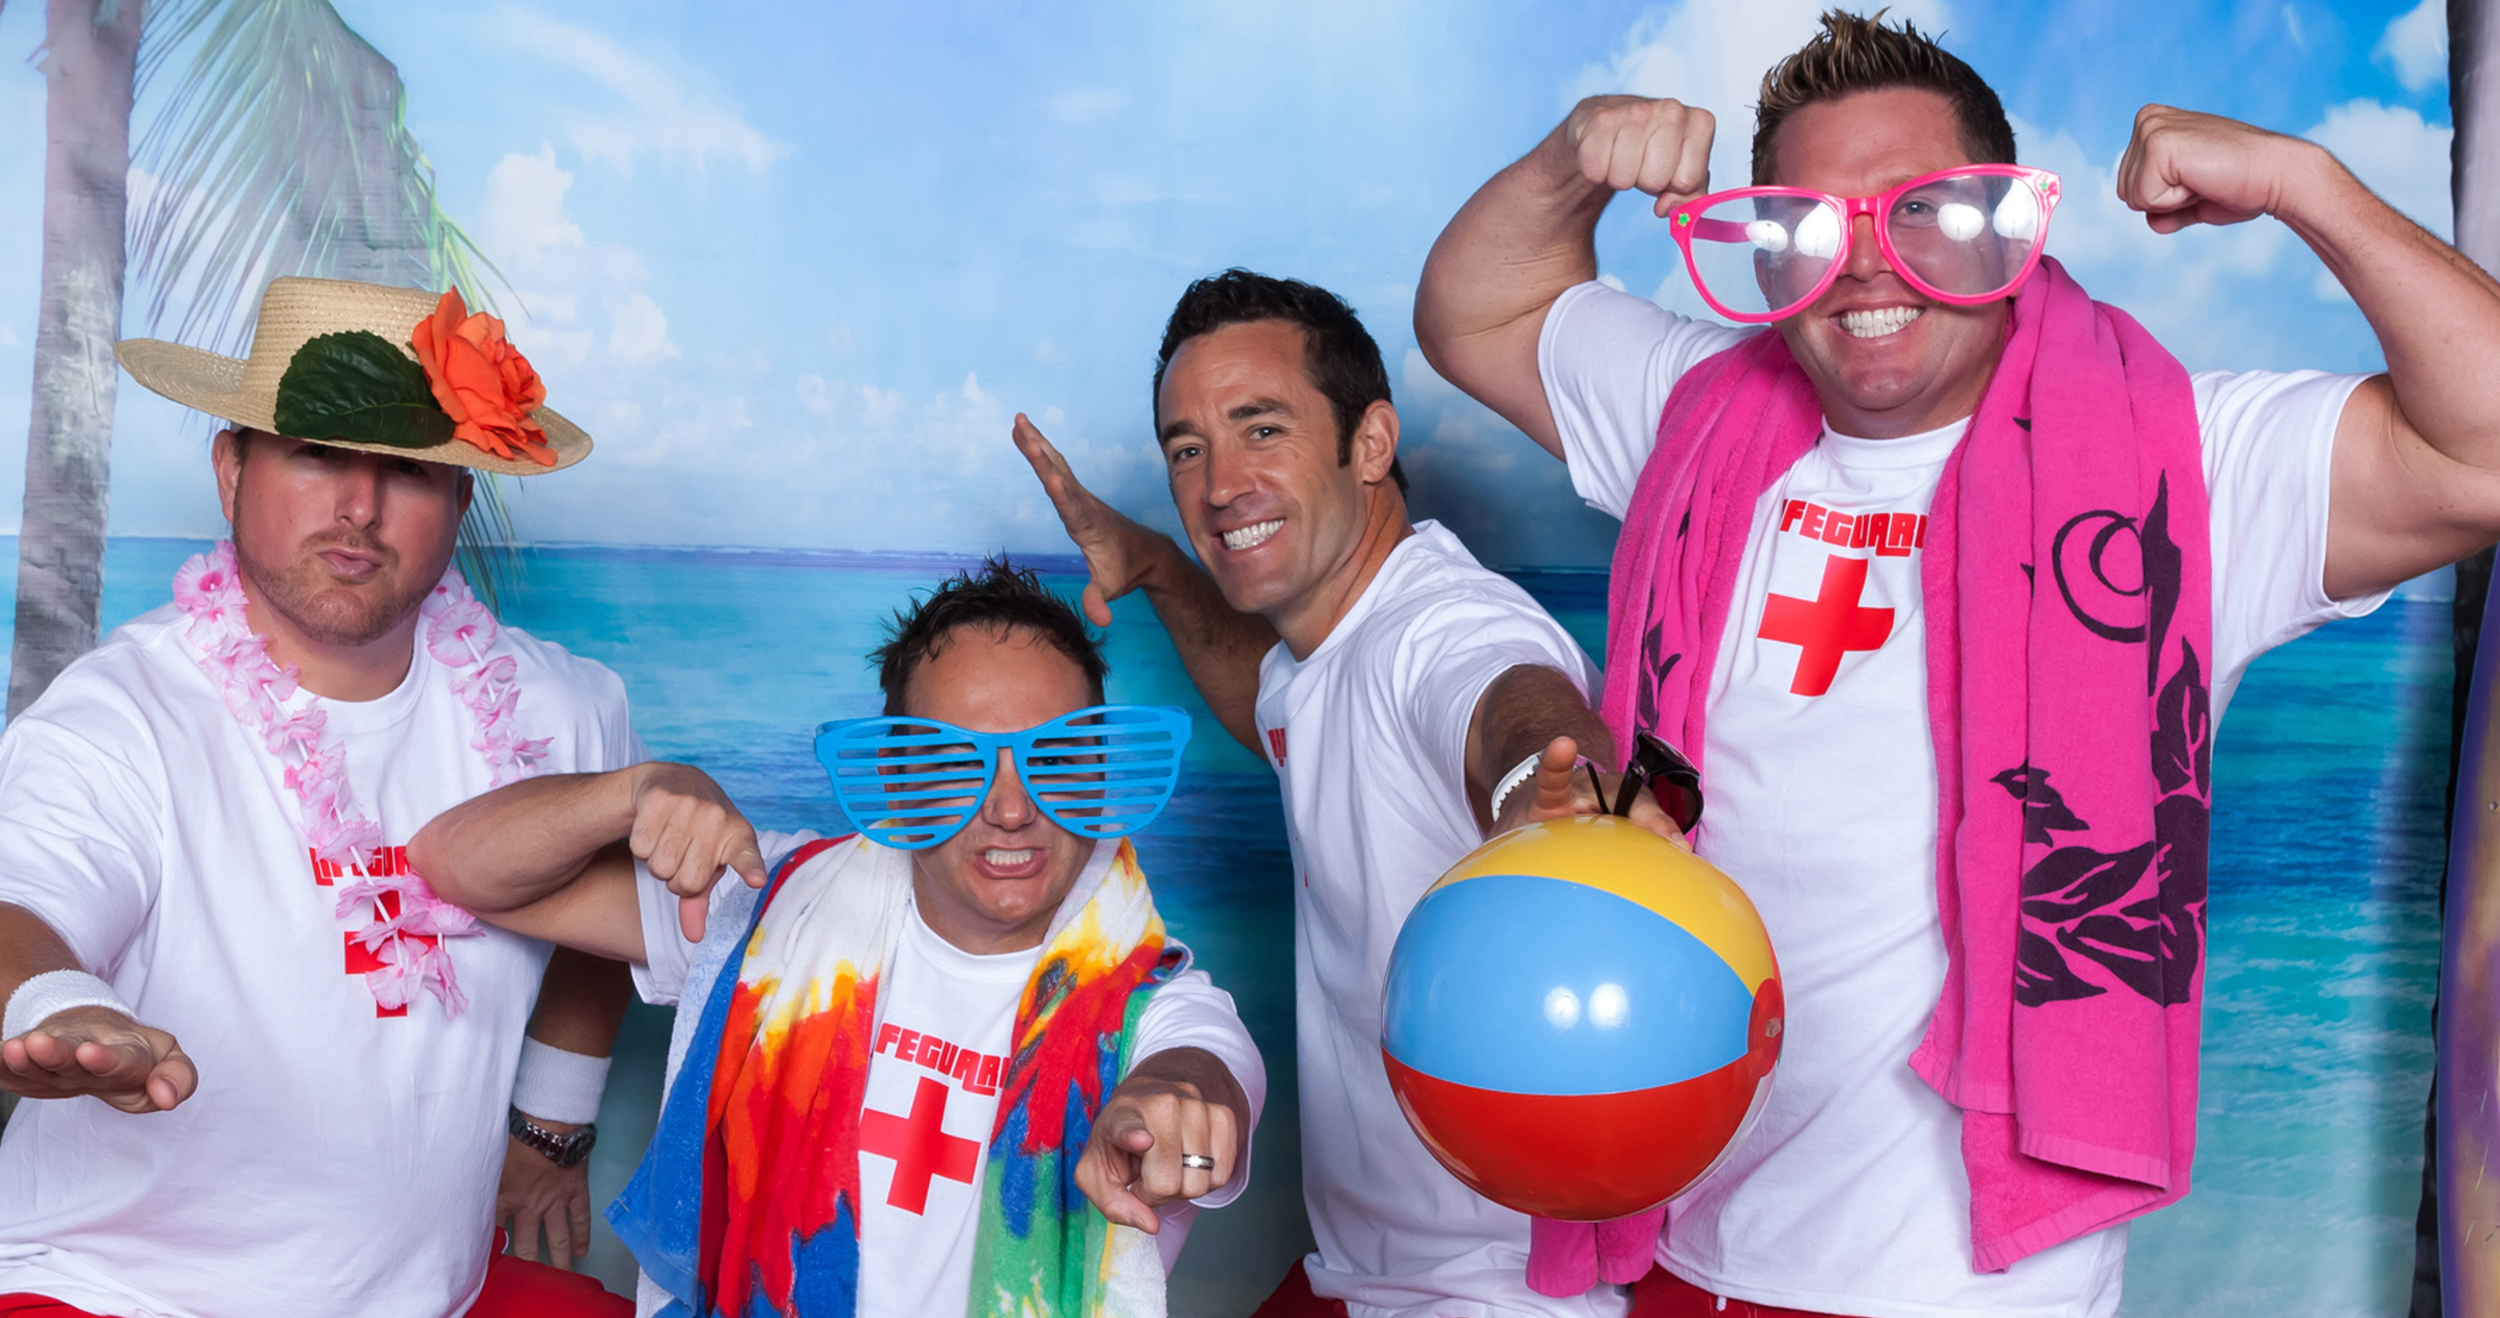 Lifeguards - R&D Events